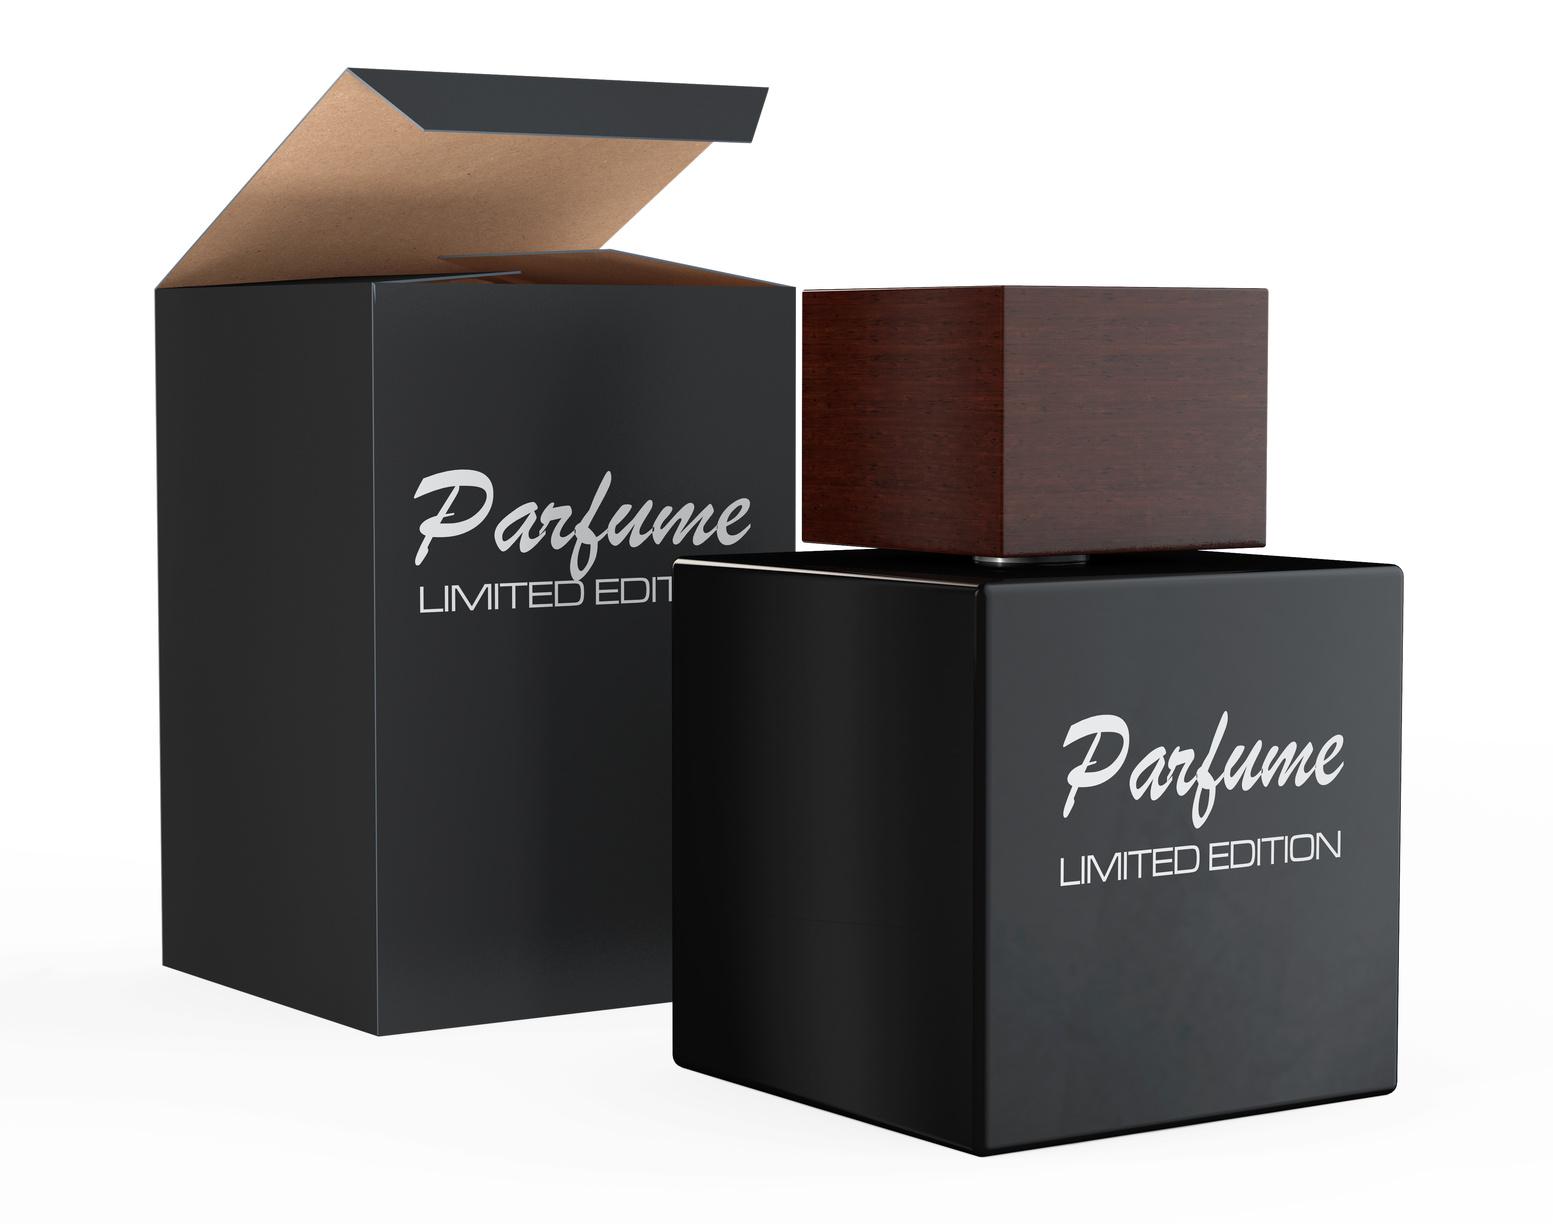 Logo printed gift boxes